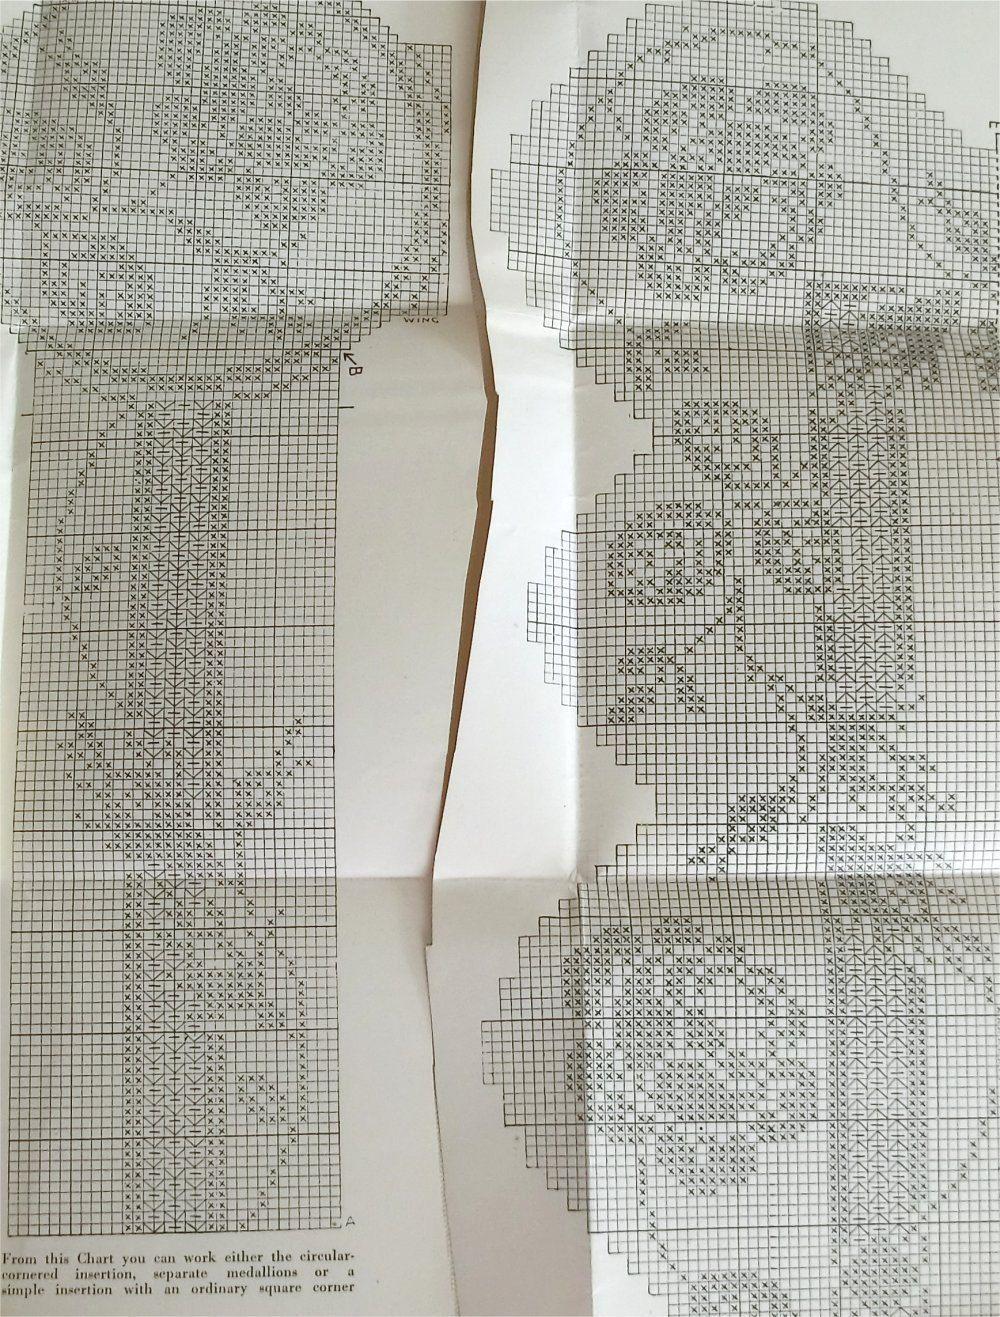 Mary Card filet crochet chart number 53 Rosebud - original pattern ...